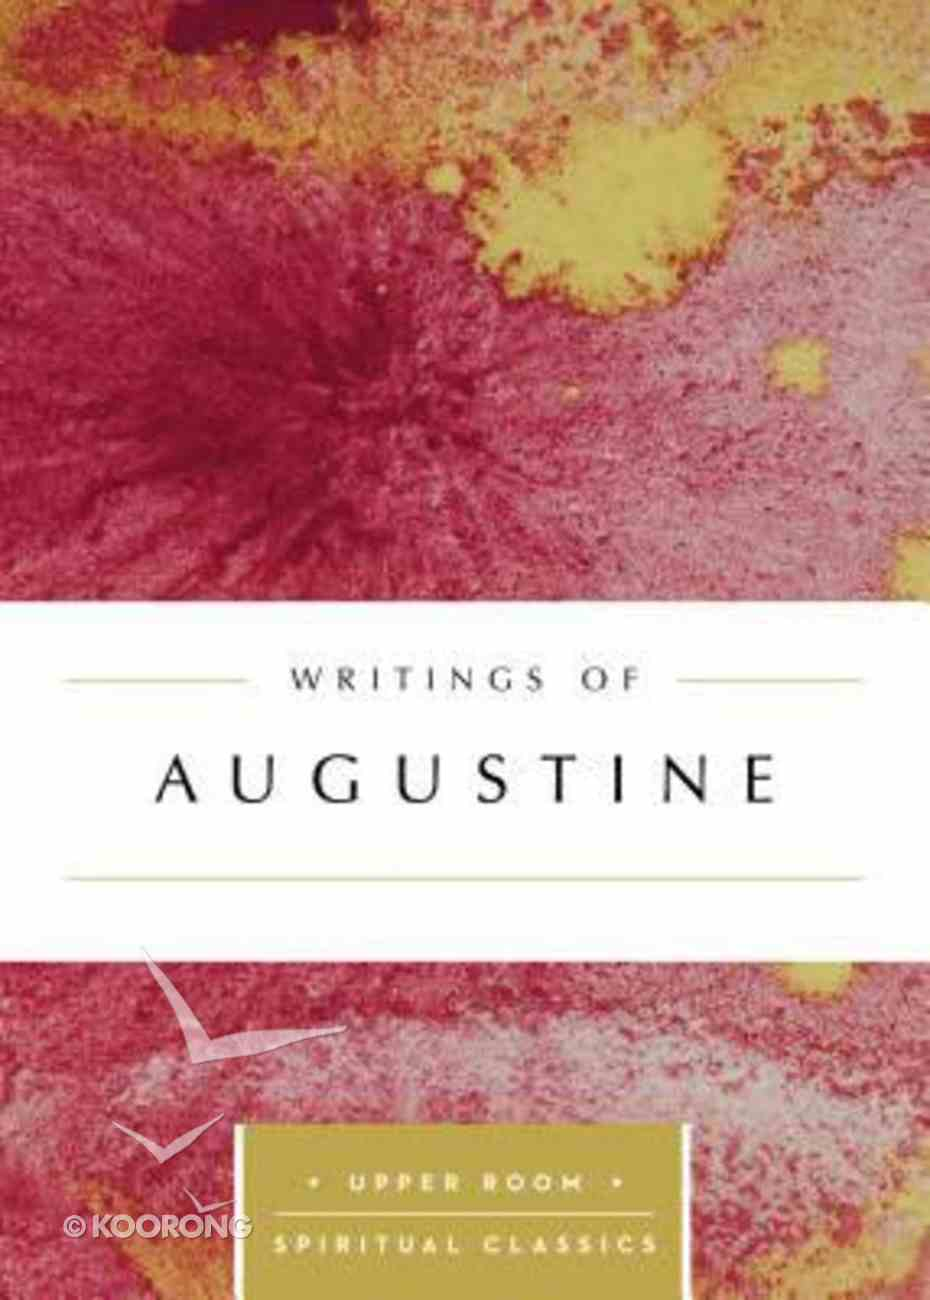 Writings of Augustine (Upper Room Spiritual Classics Series) Paperback